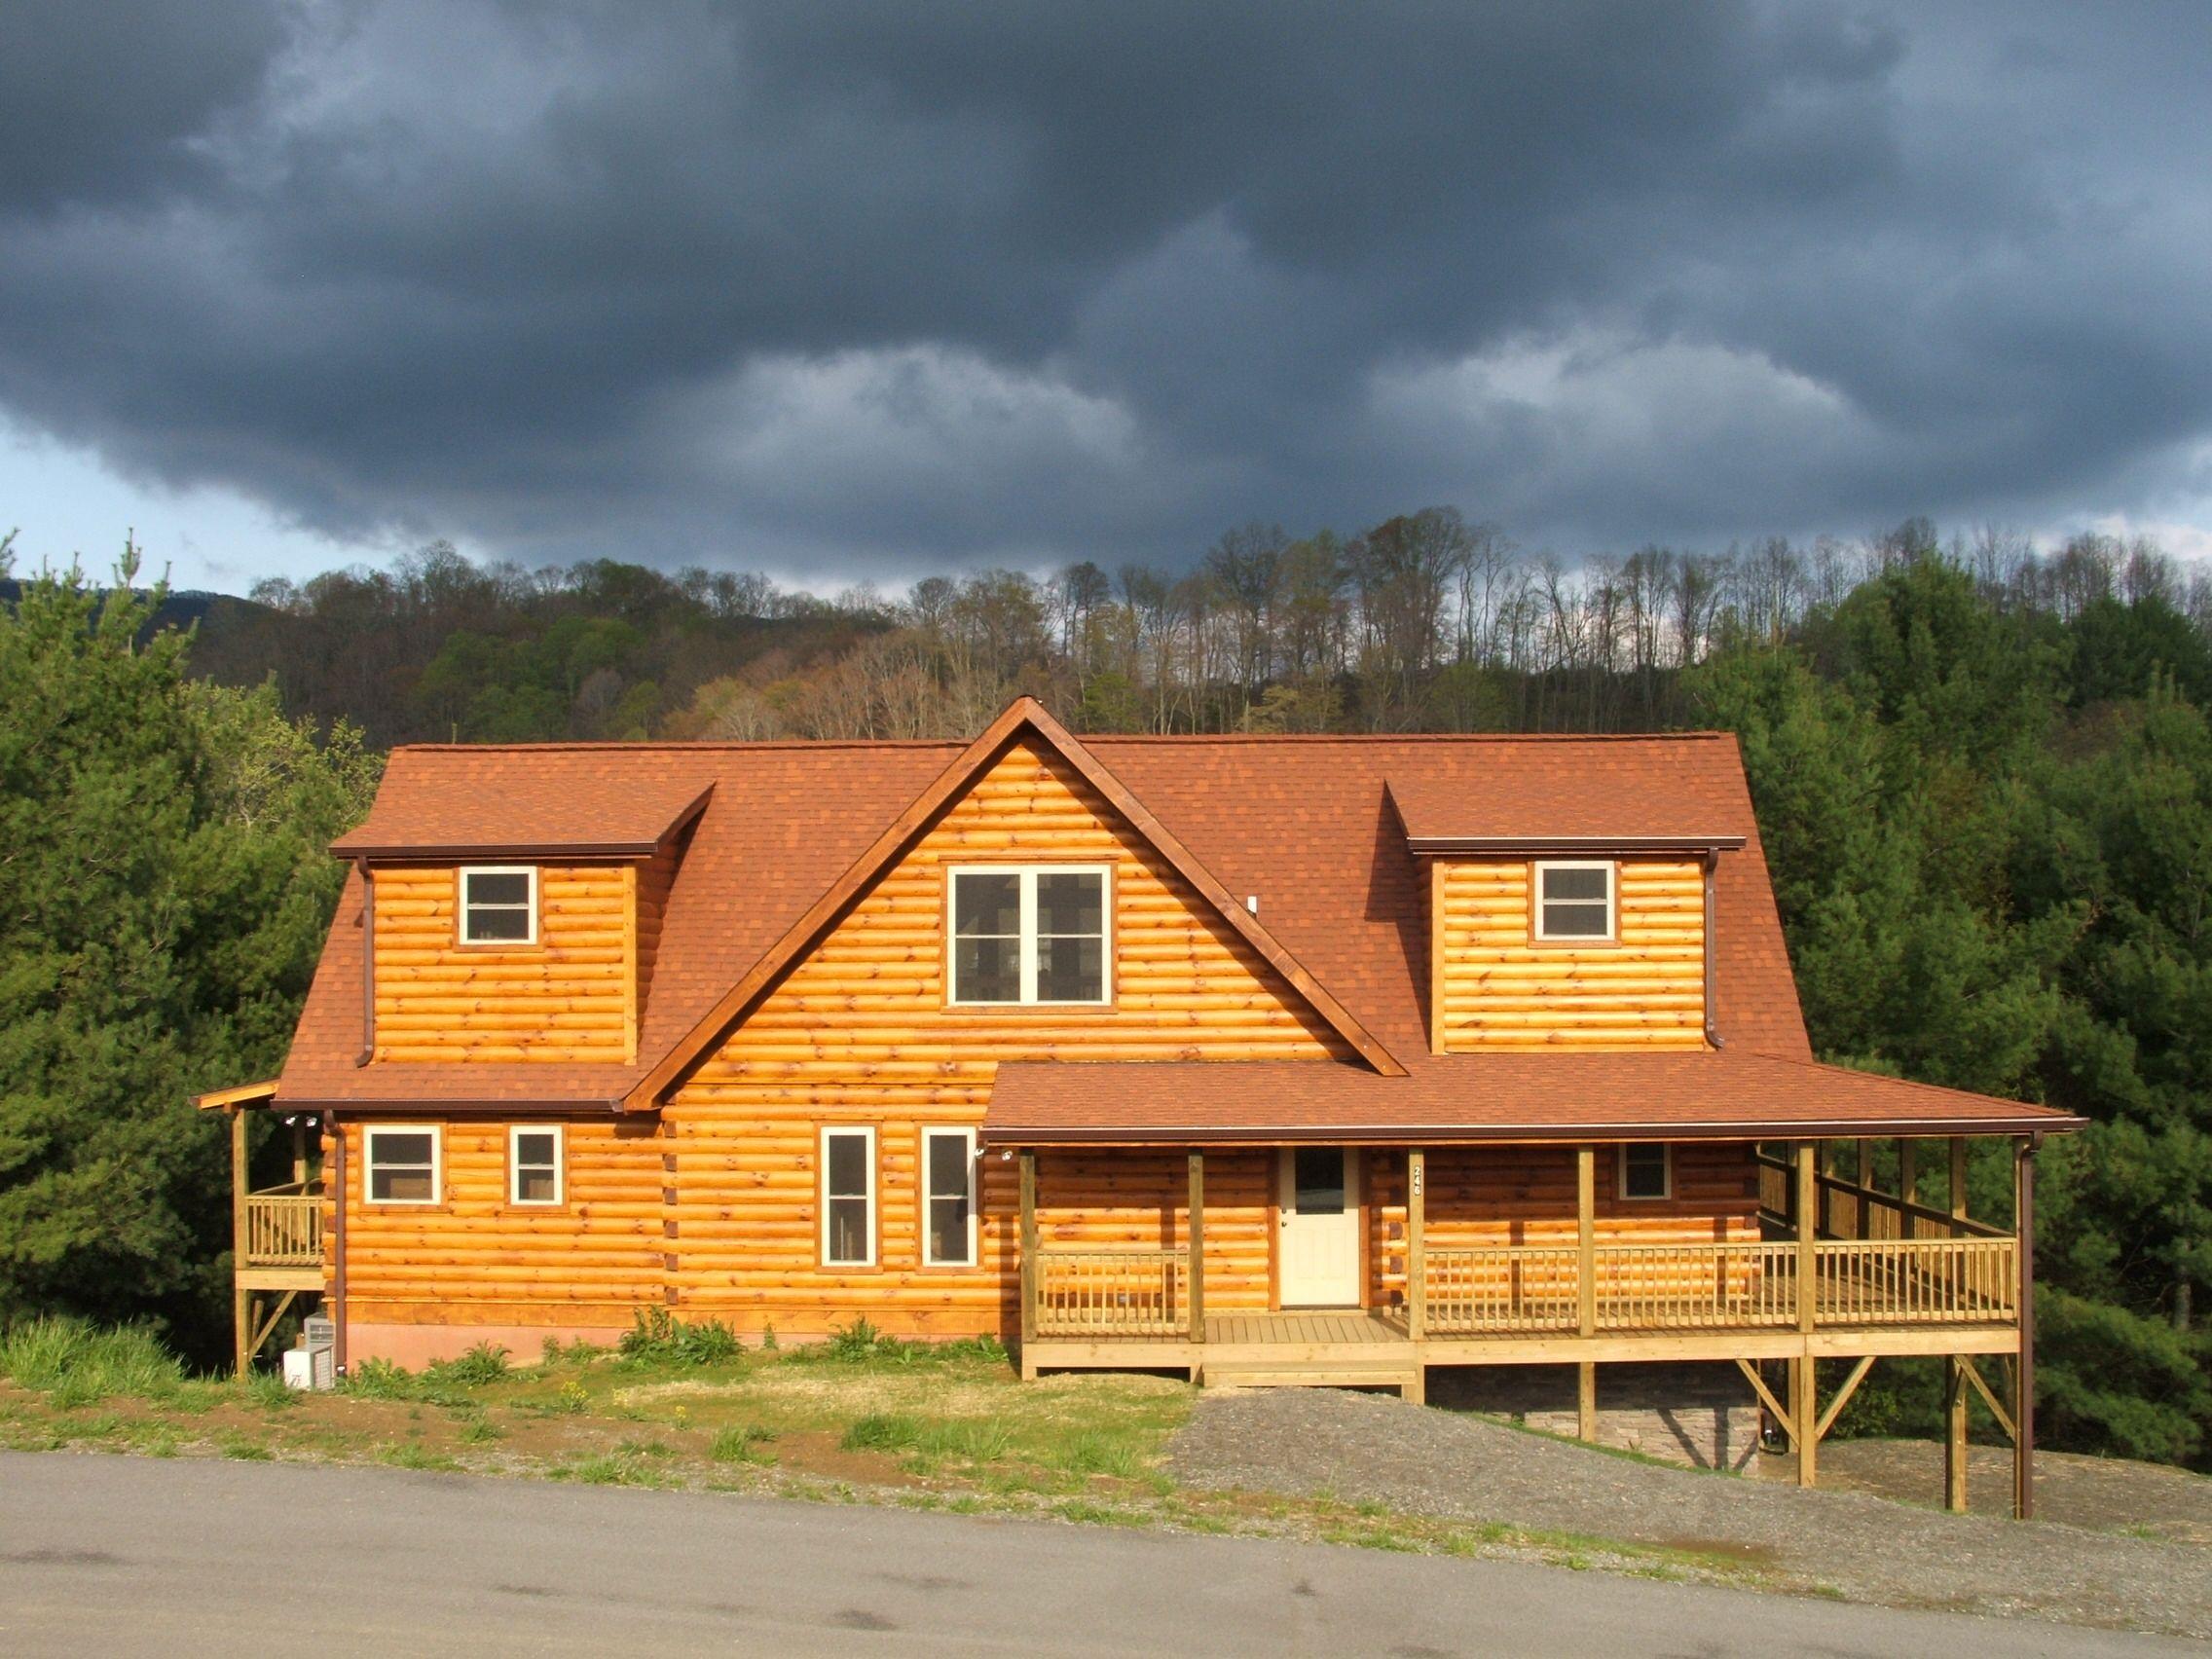 Jocassee Cabin Series designed by Blue Ridge Log Cabins jocassee